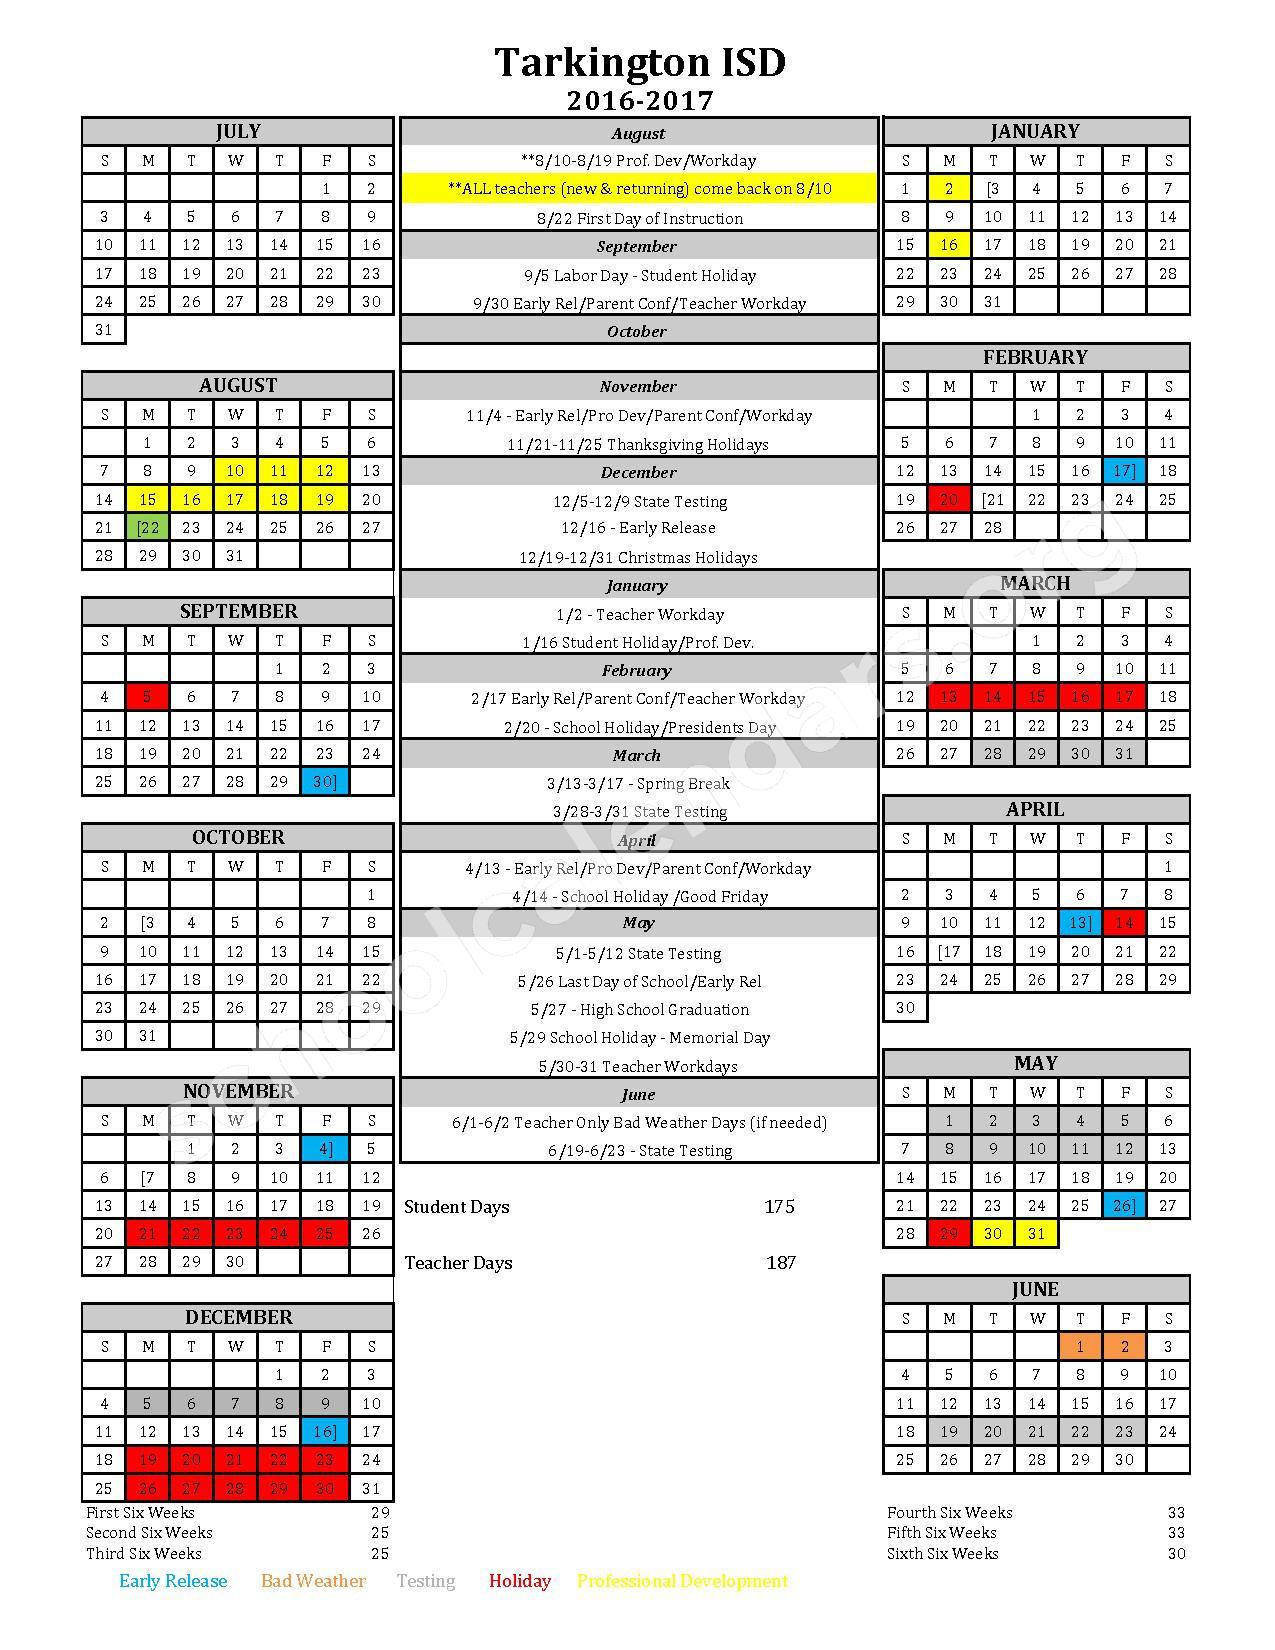 2016 - 2017 District Calendar – Tarkington Independent School District – page 1